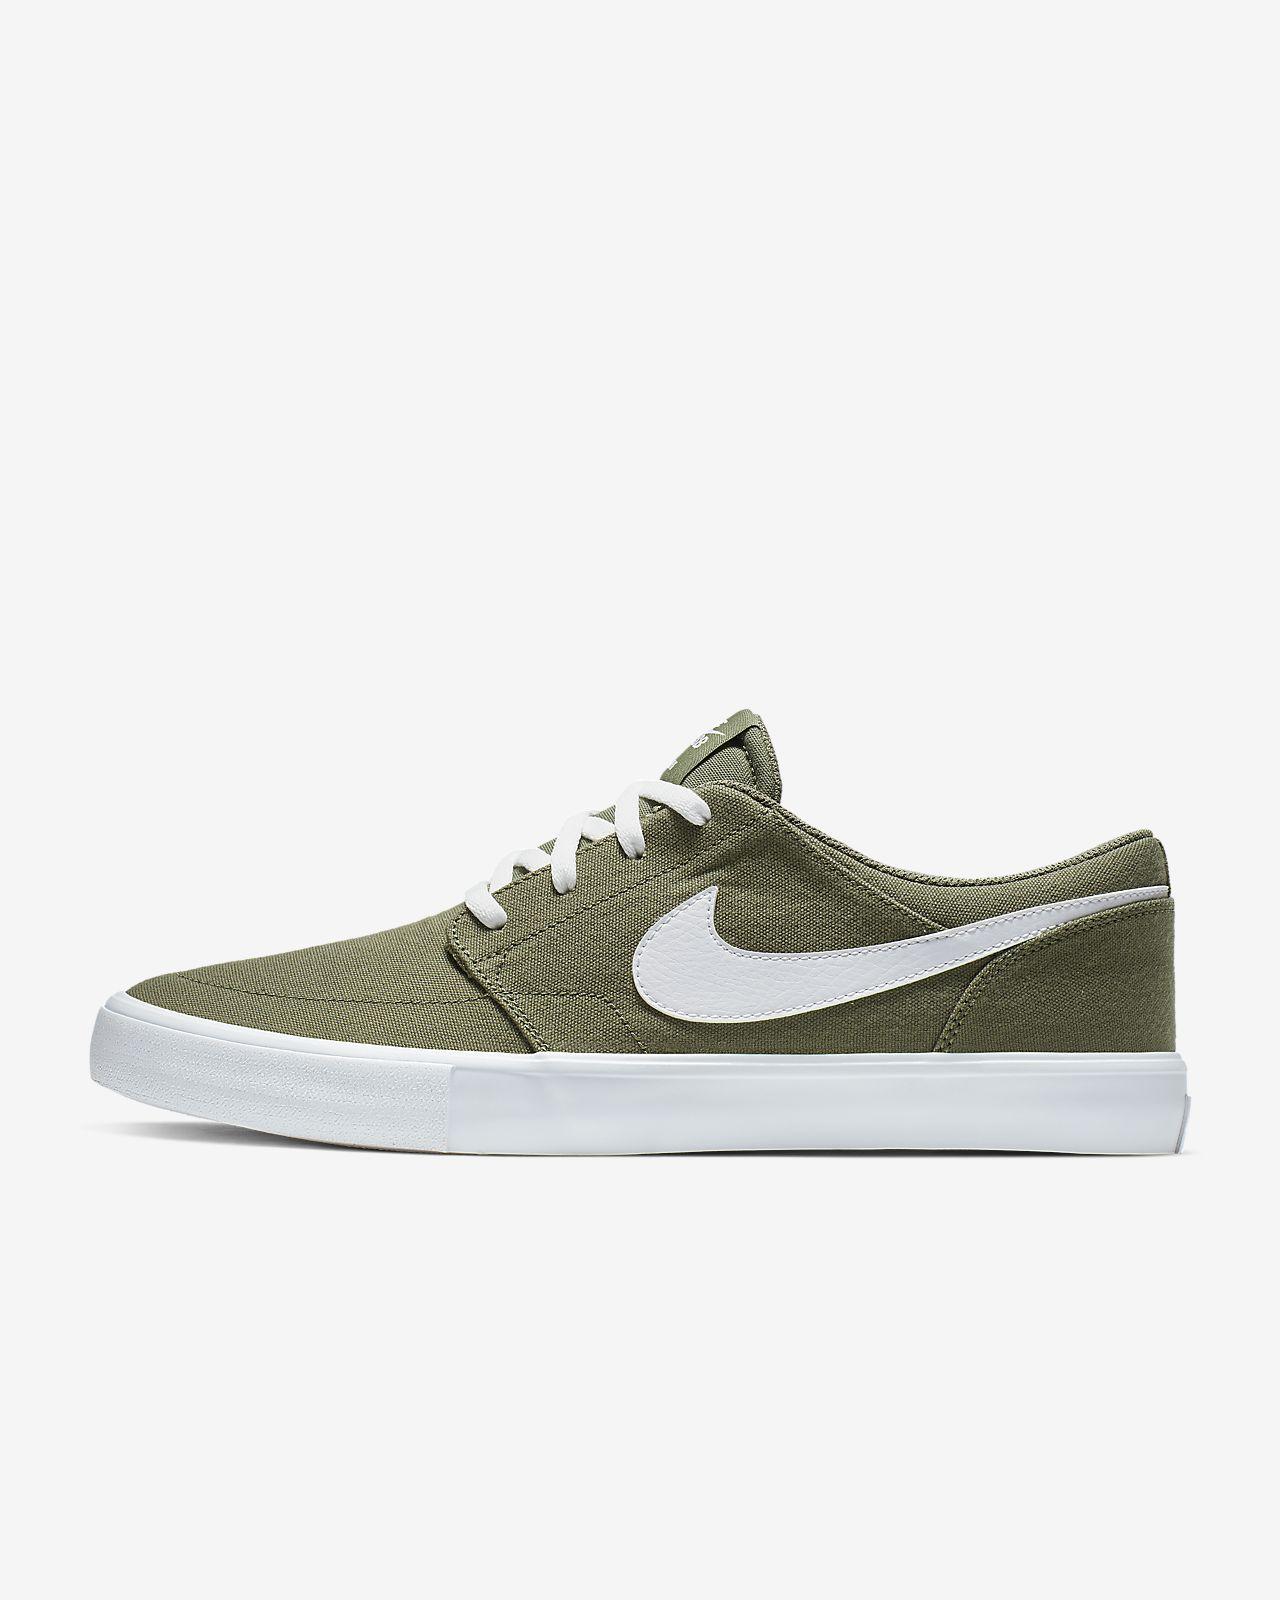 Nike SB Solarsoft Portmore 2 滑板鞋